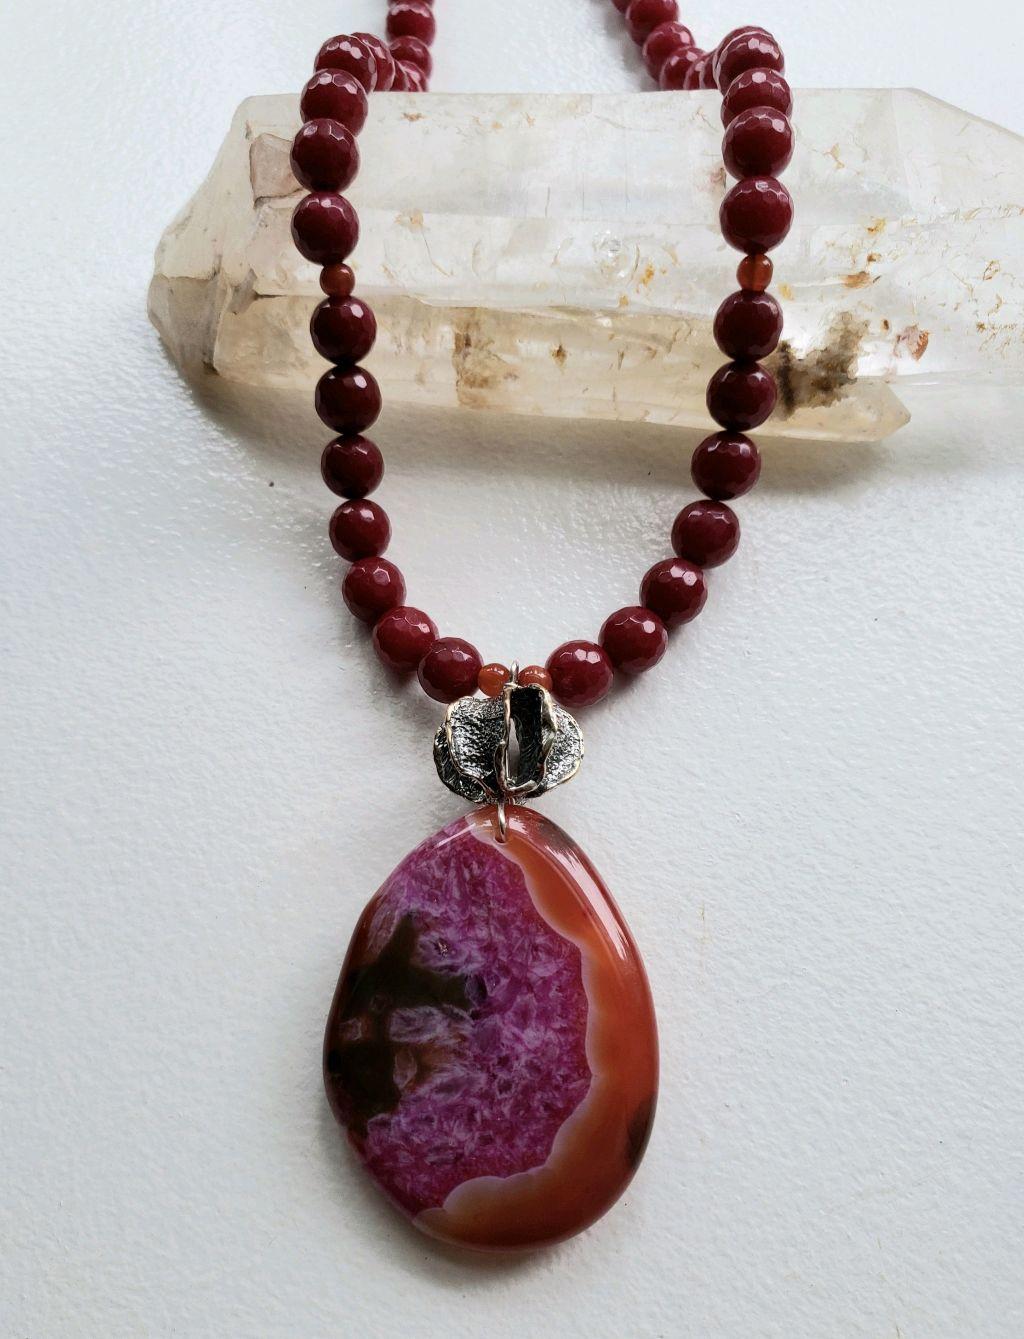 Huge pink-orange Agate pendant on Rubylite jade beads